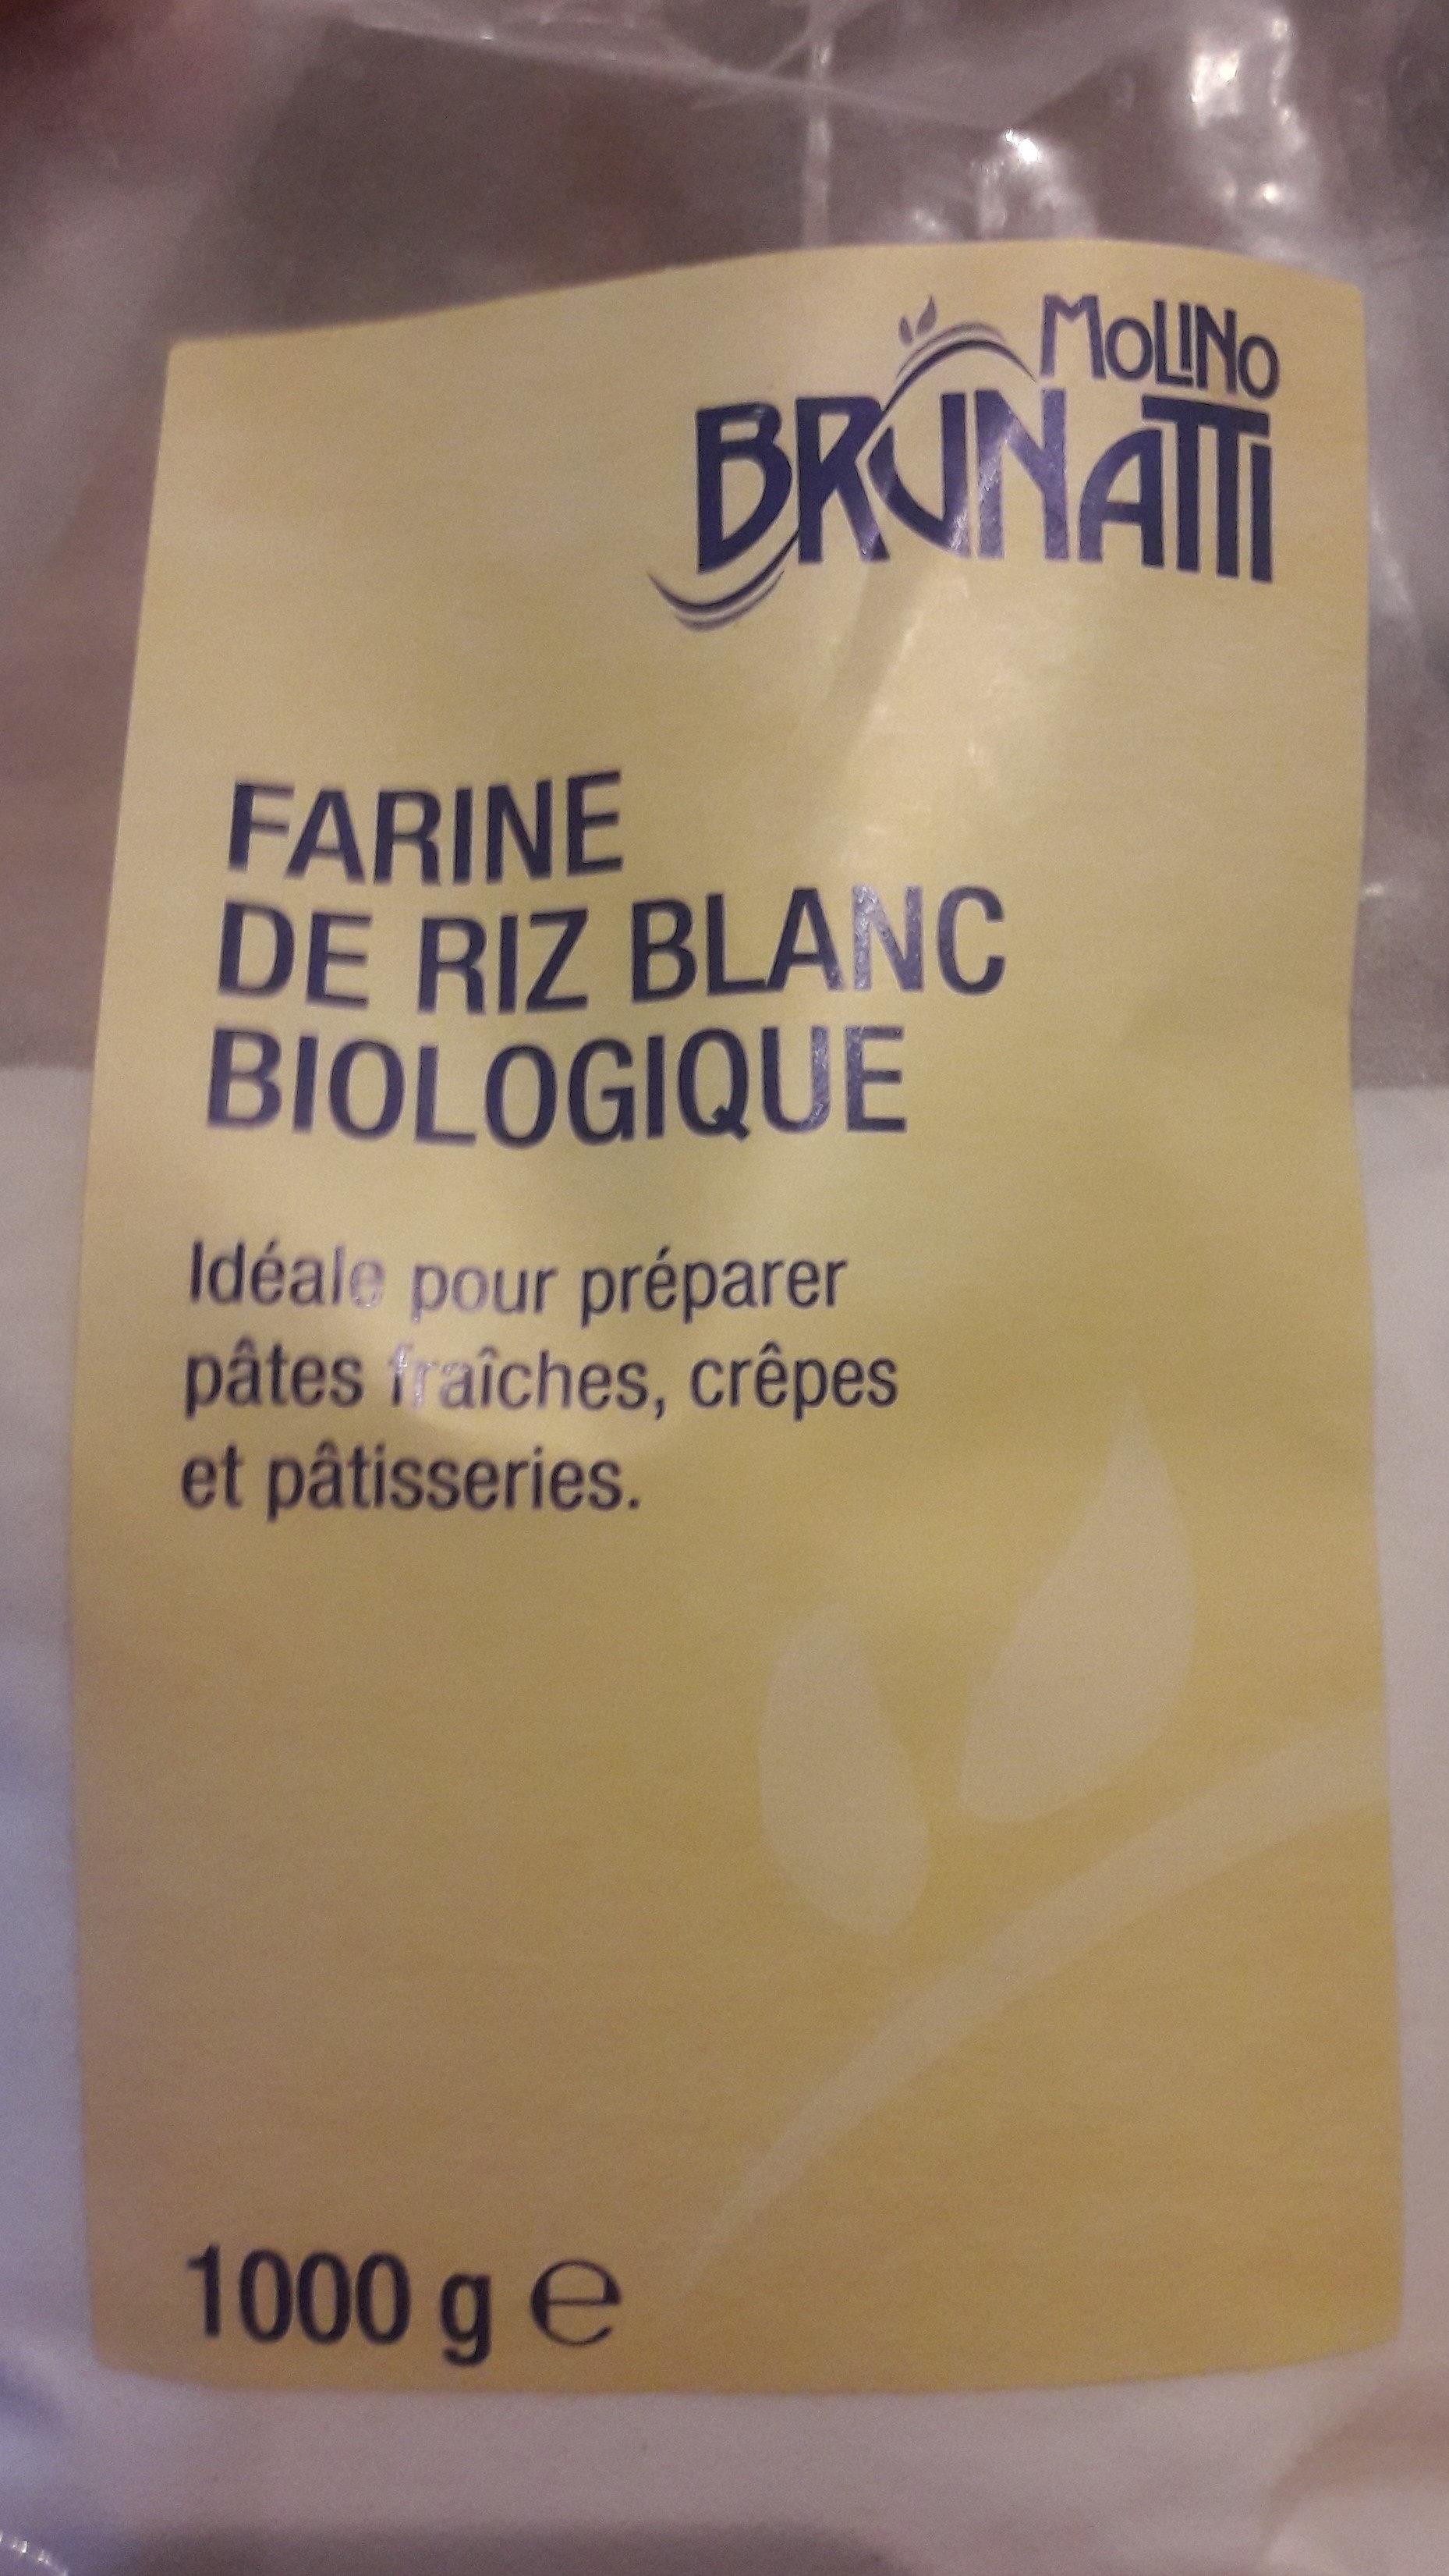 Farine riz blanc biologique - Produit - fr